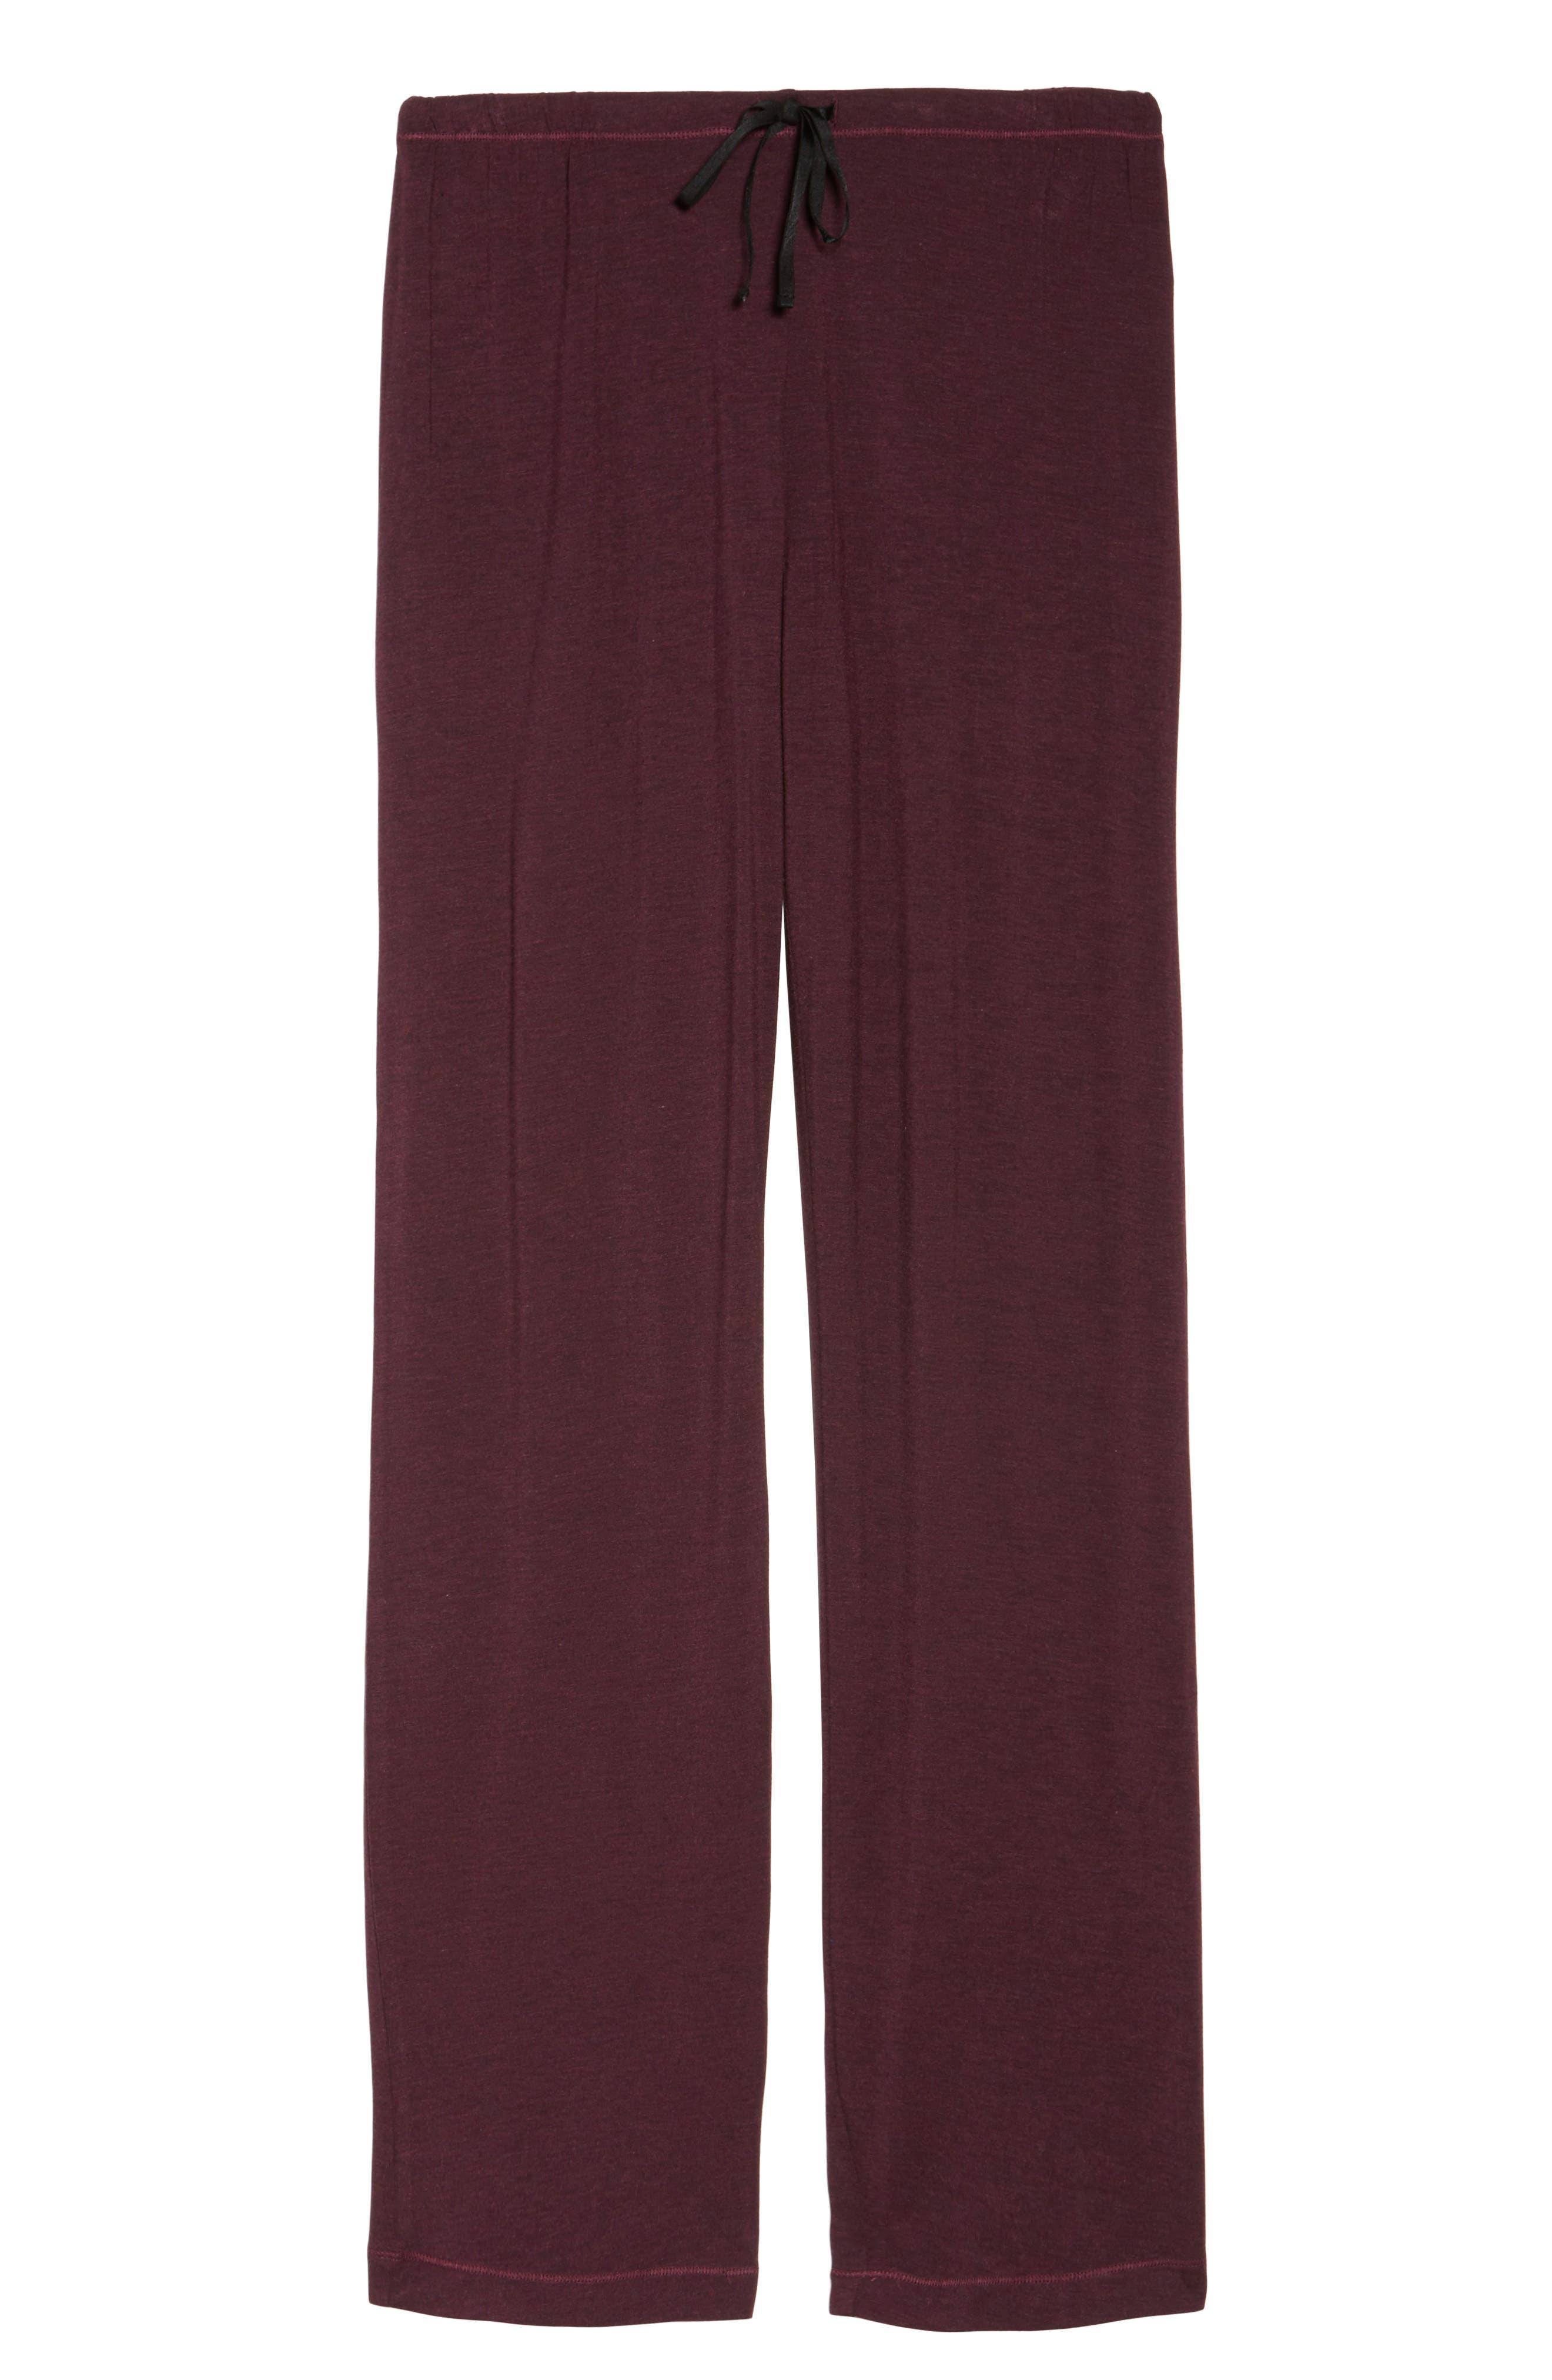 Jersey Lounge Pants,                             Alternate thumbnail 6, color,                             930